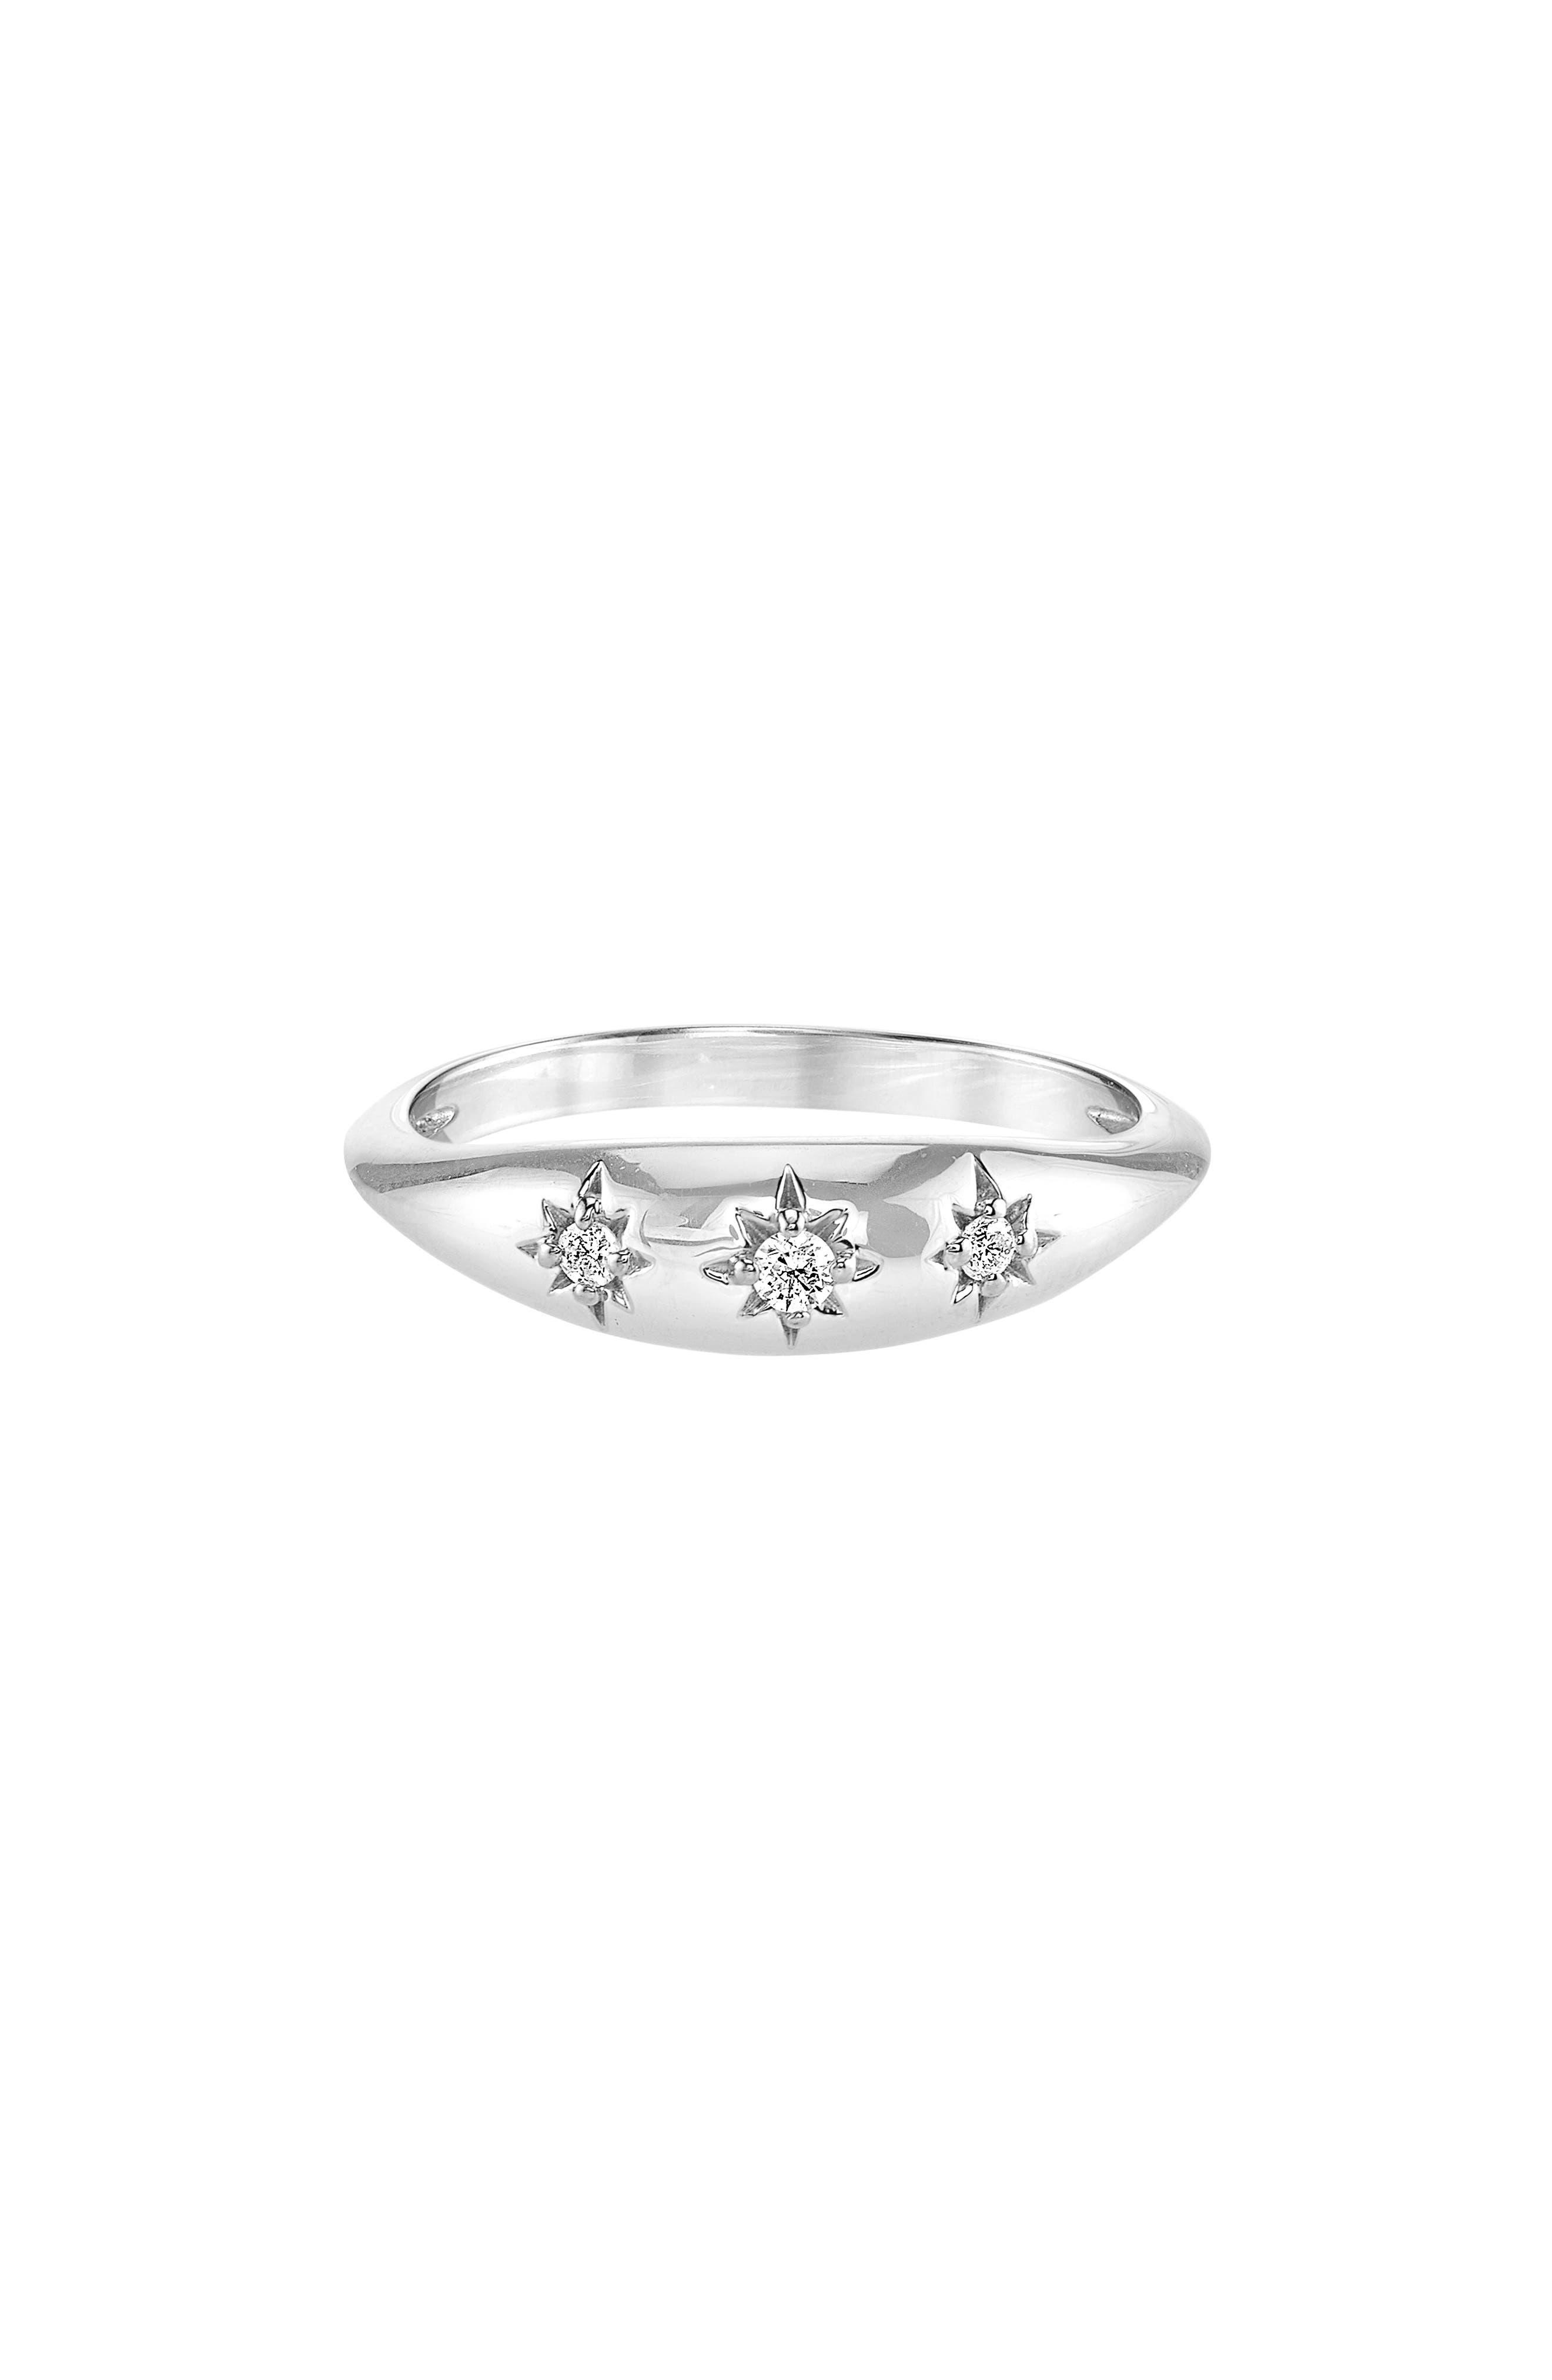 x Michelle Branch Diamond Ring,                             Main thumbnail 1, color,                             Silver